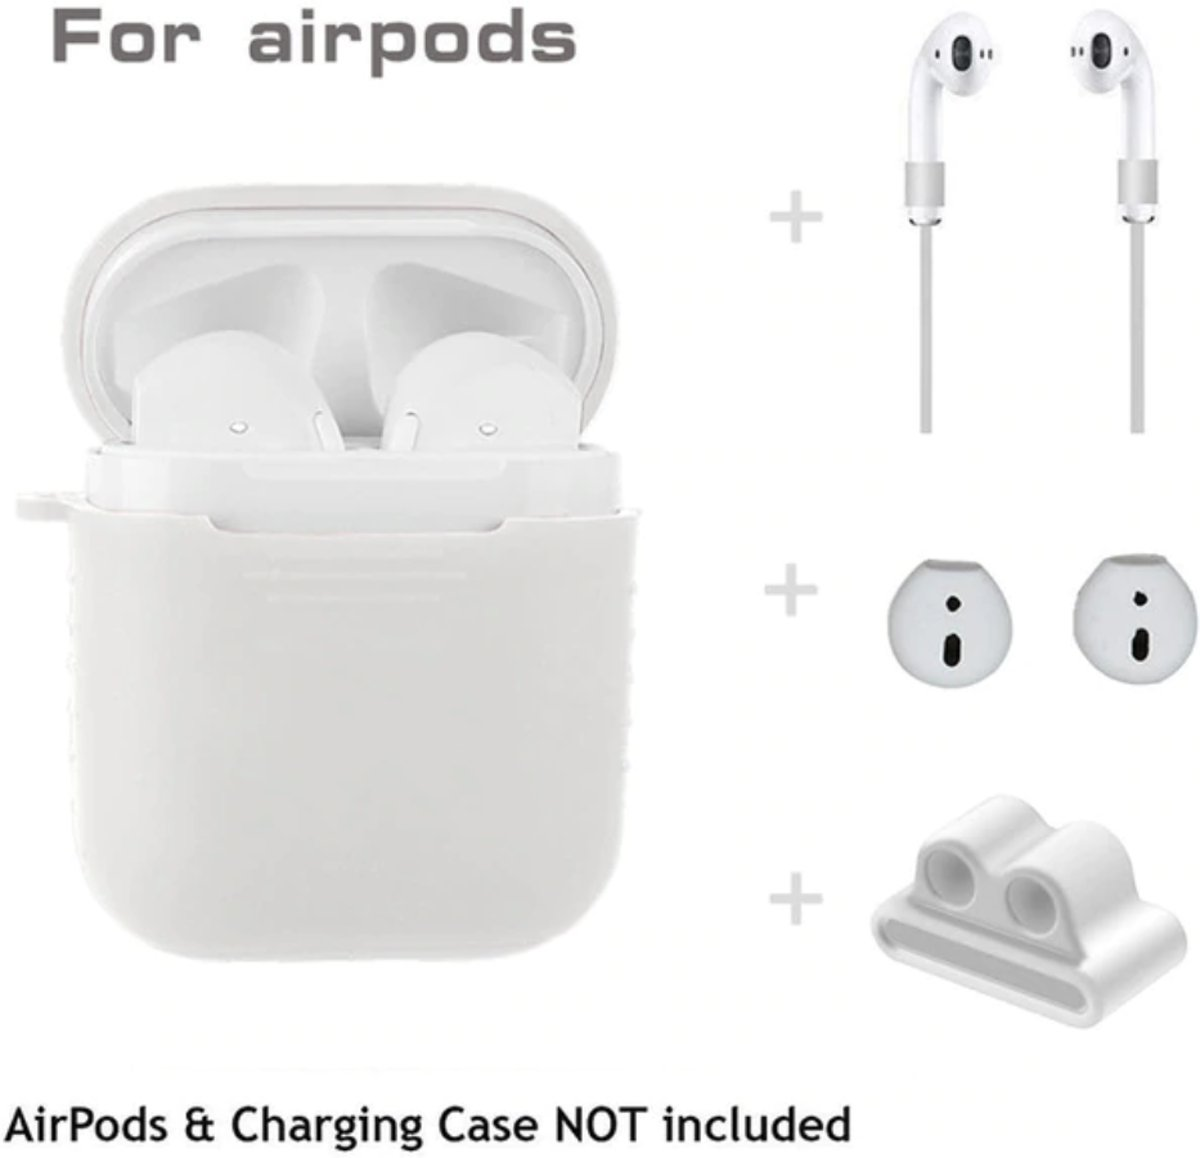 Airpod Case 5 in 1, geschikt voor airpod, airpod hoesje, airpod cover 5 in 1 kopen